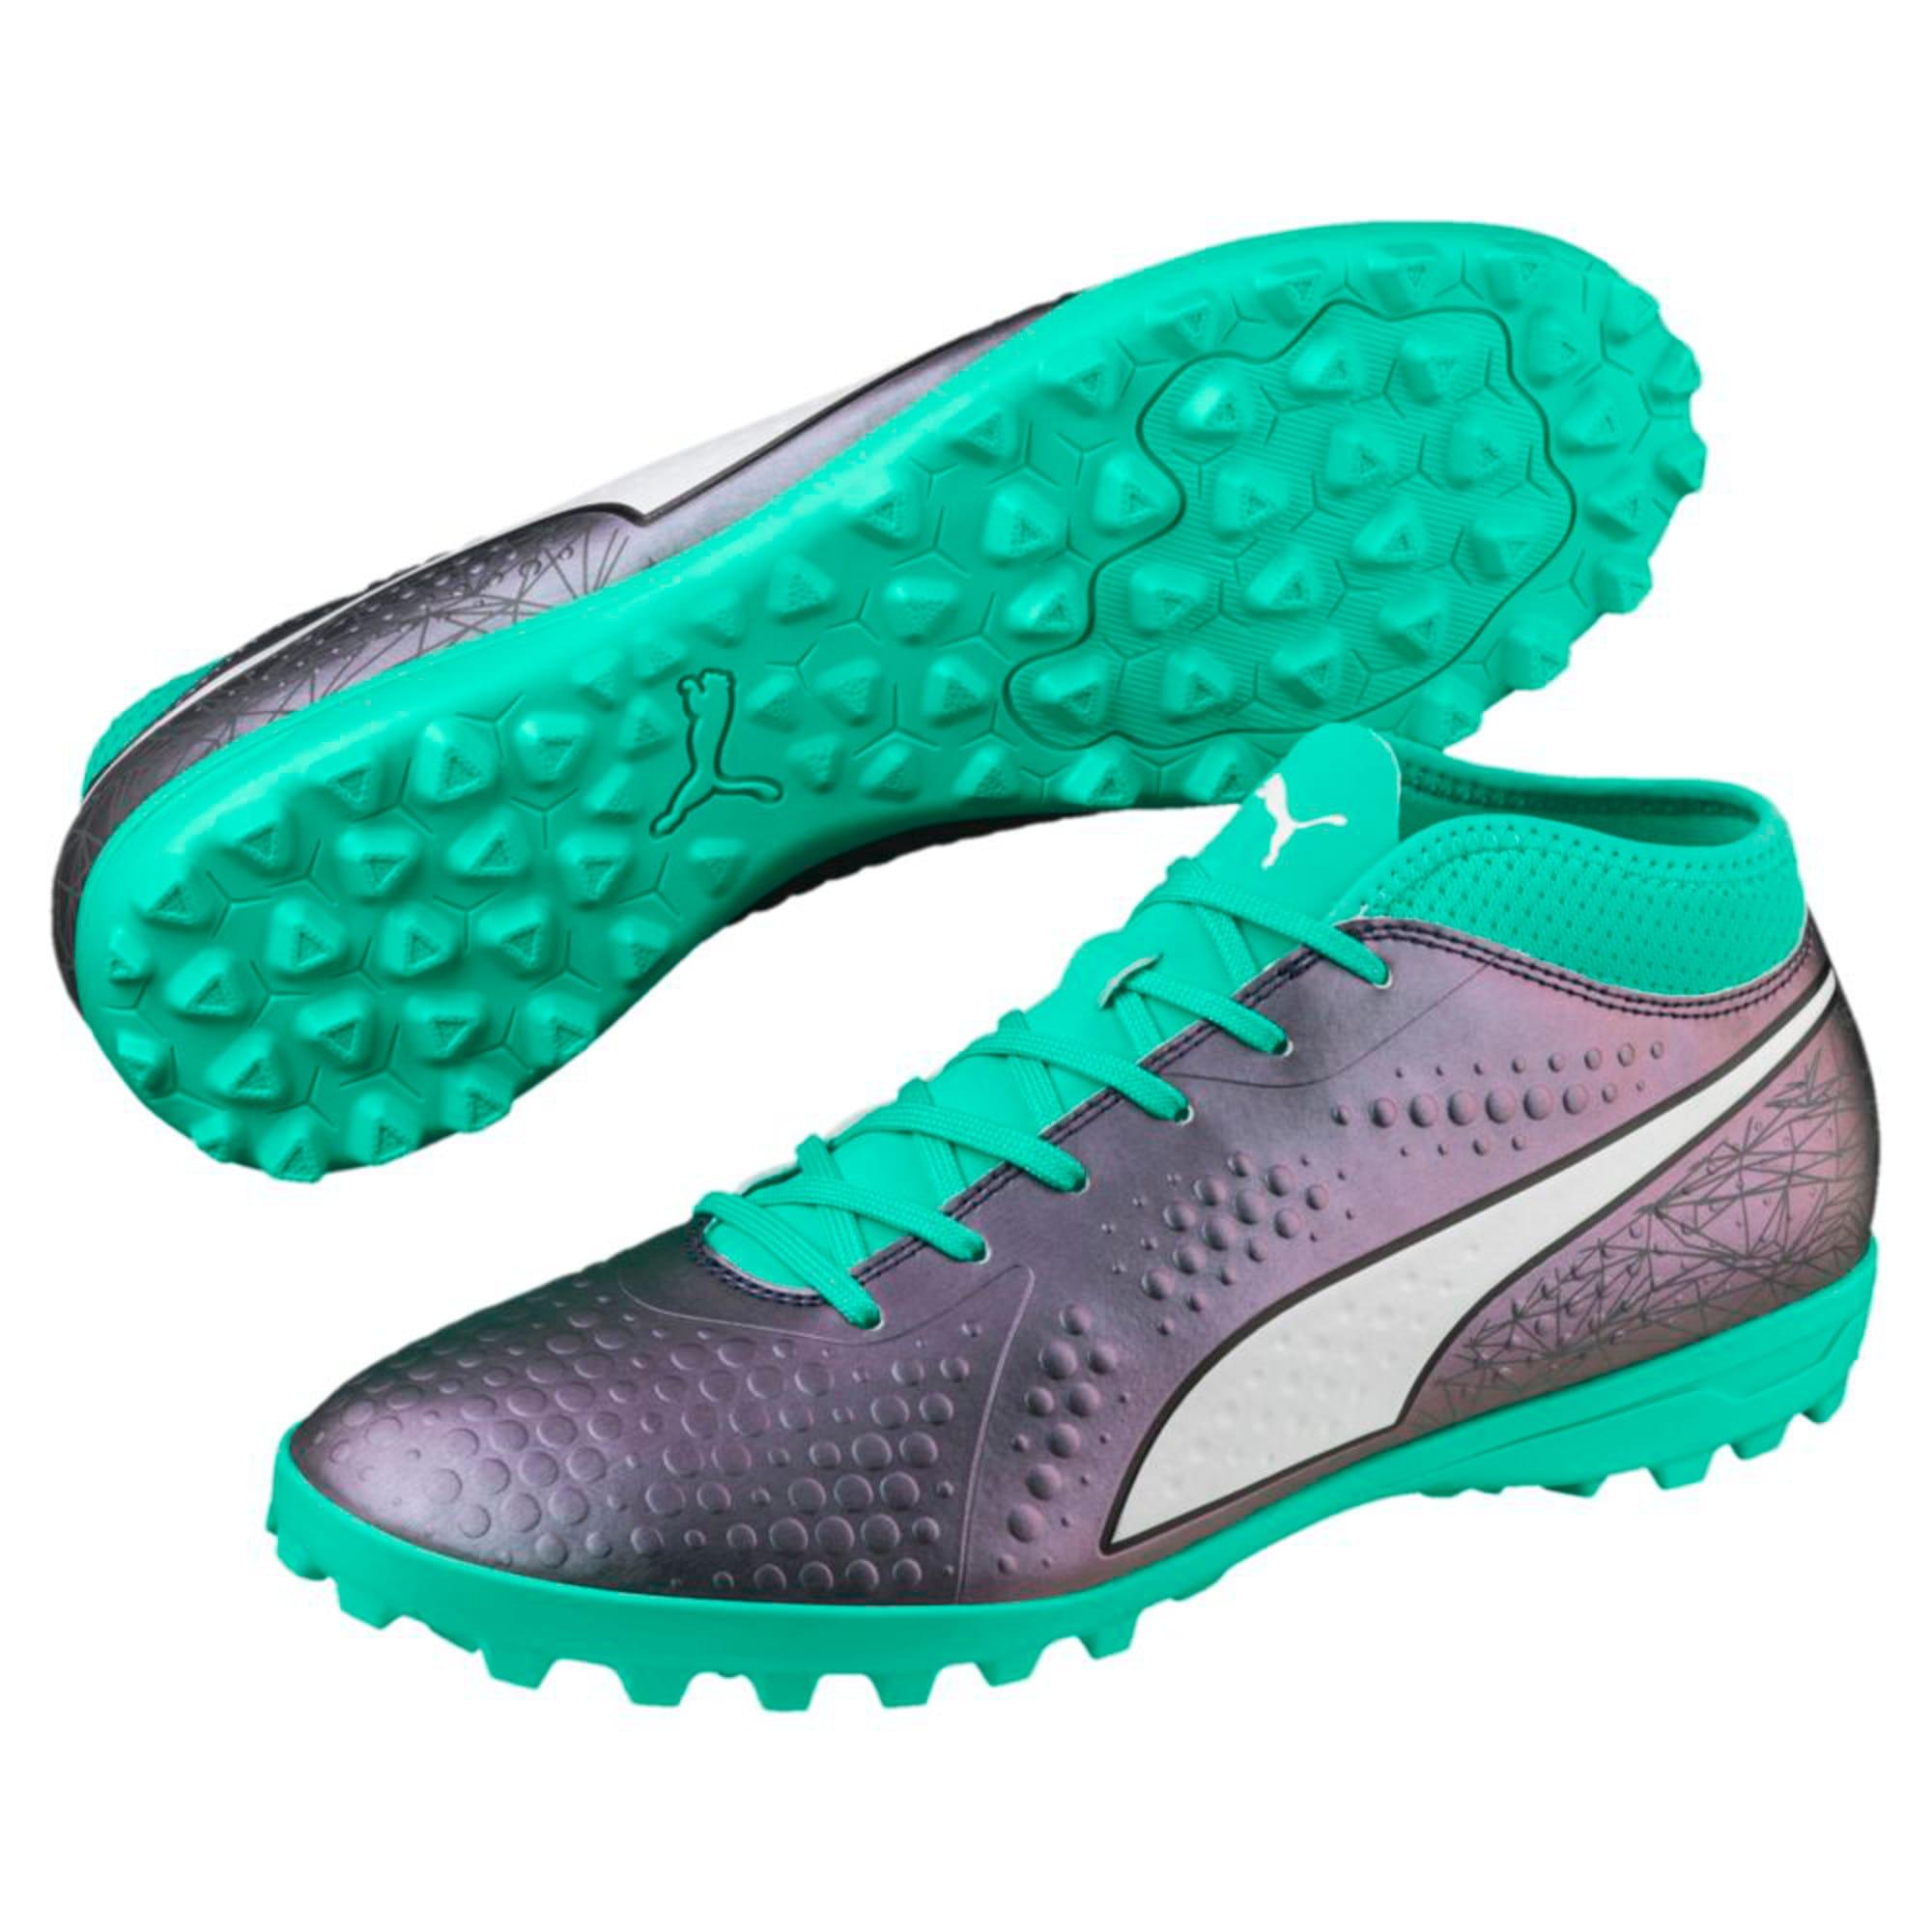 Thumbnail 6 of ONE 4 ILLUMINATE Synthetic TT  Football Boots, Col Shift-Green-White-Black, medium-IND